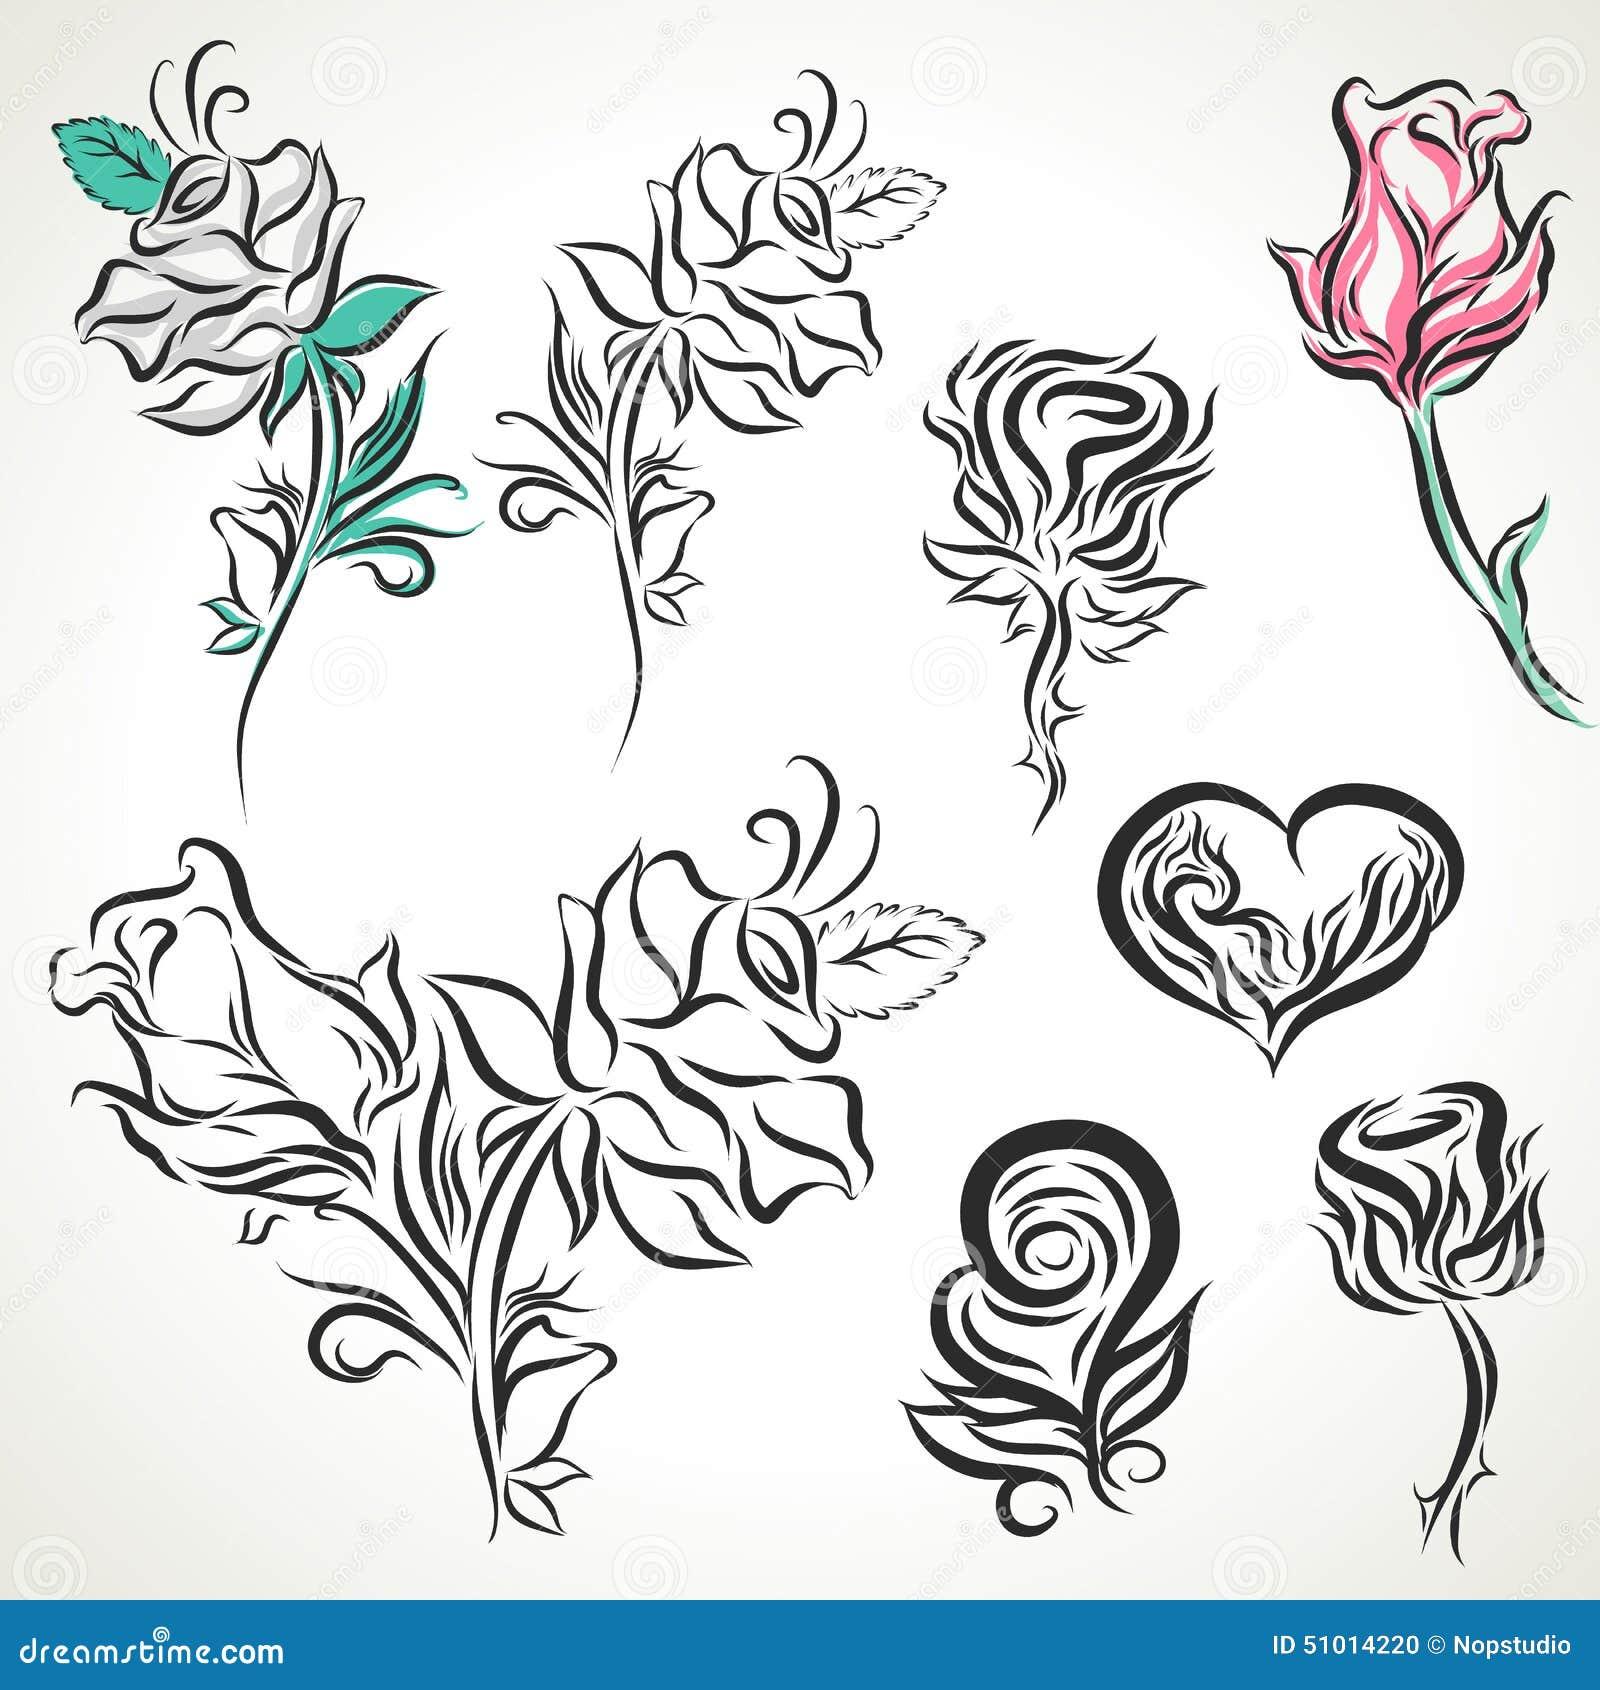 Rose Of Tribal Tattoo Set Stock Vector Illustration Of Decorative